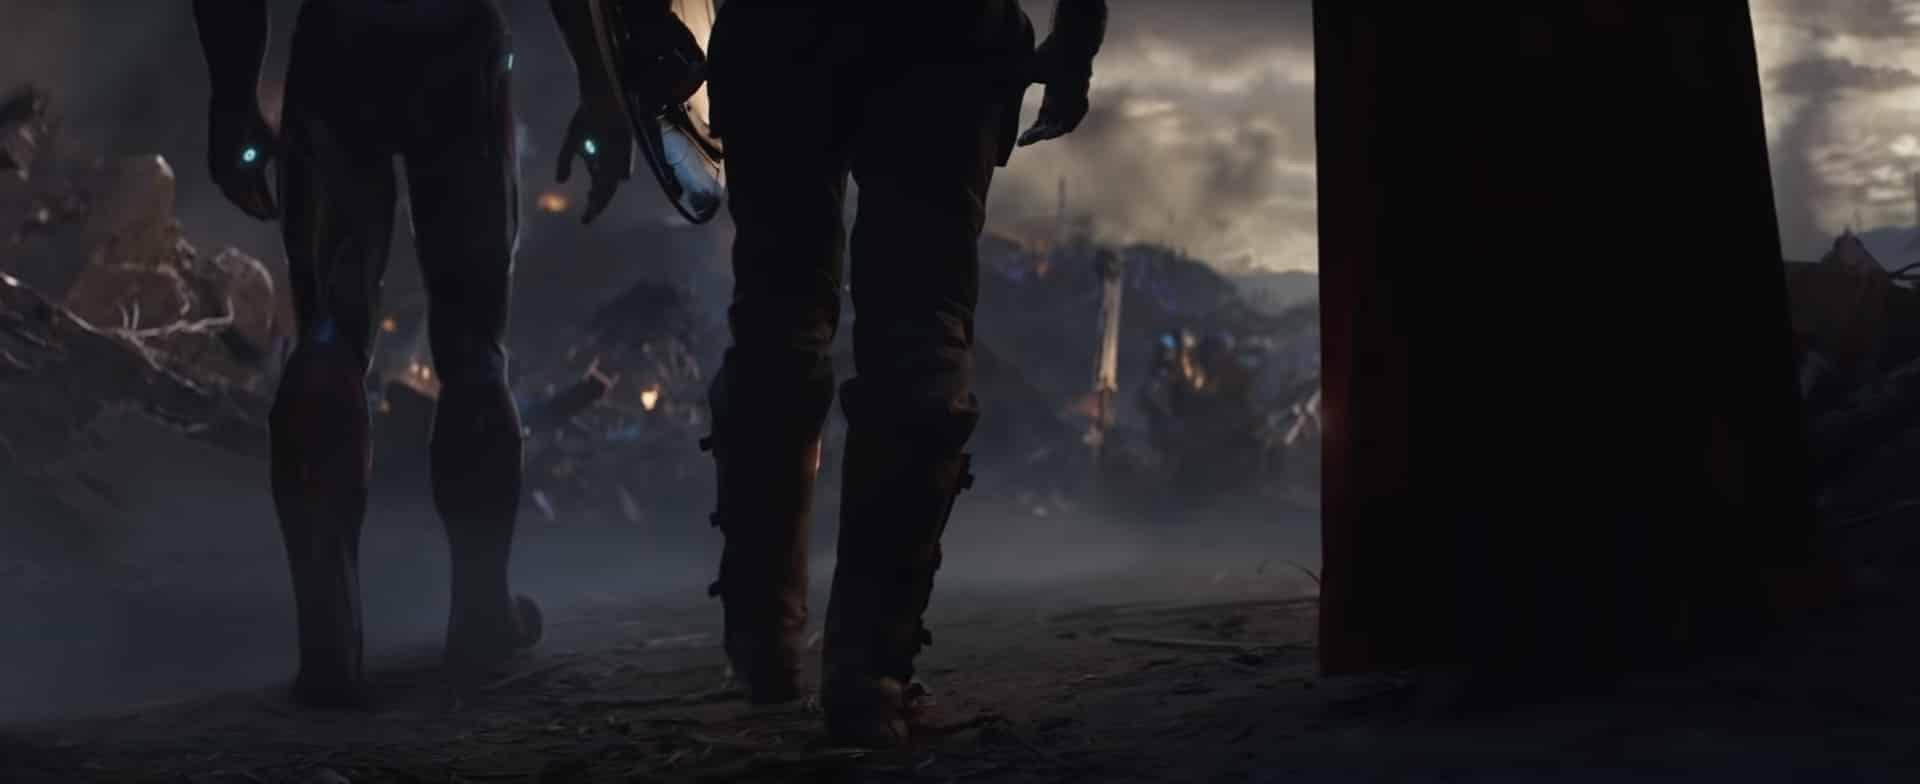 Marvel Vengadore: Endgame. Thanos ¿Derrotado?